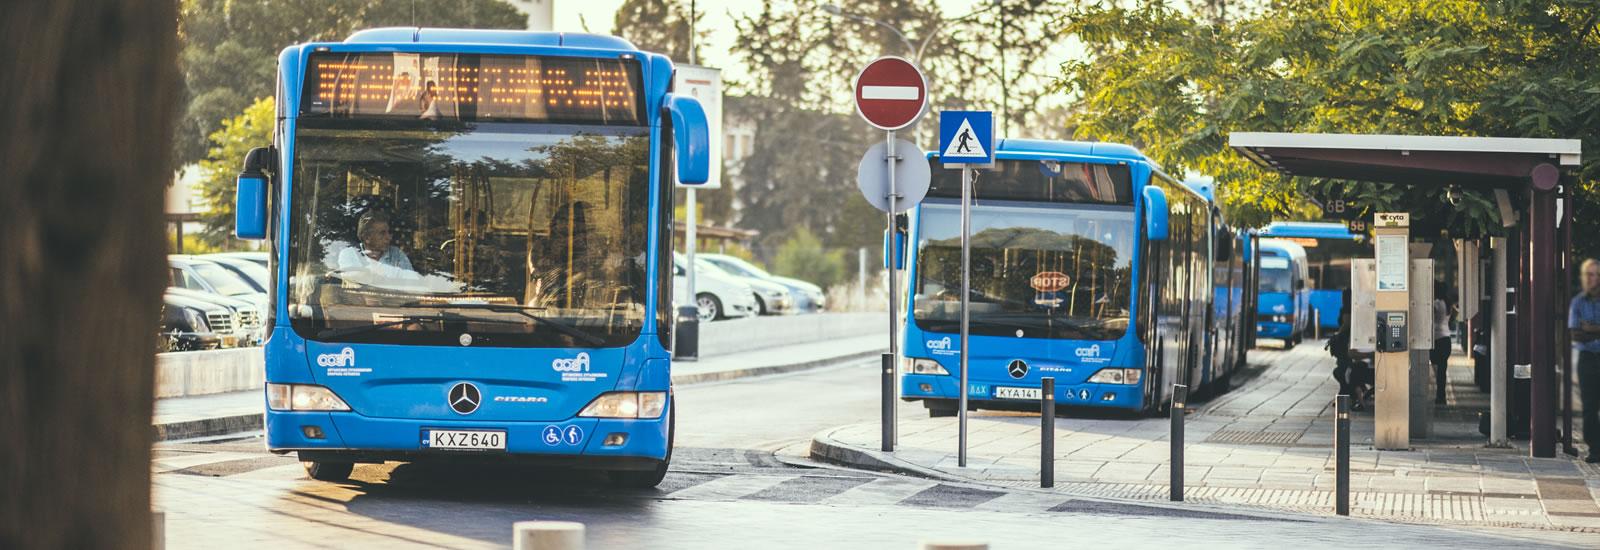 Транспорт в Ларнаке